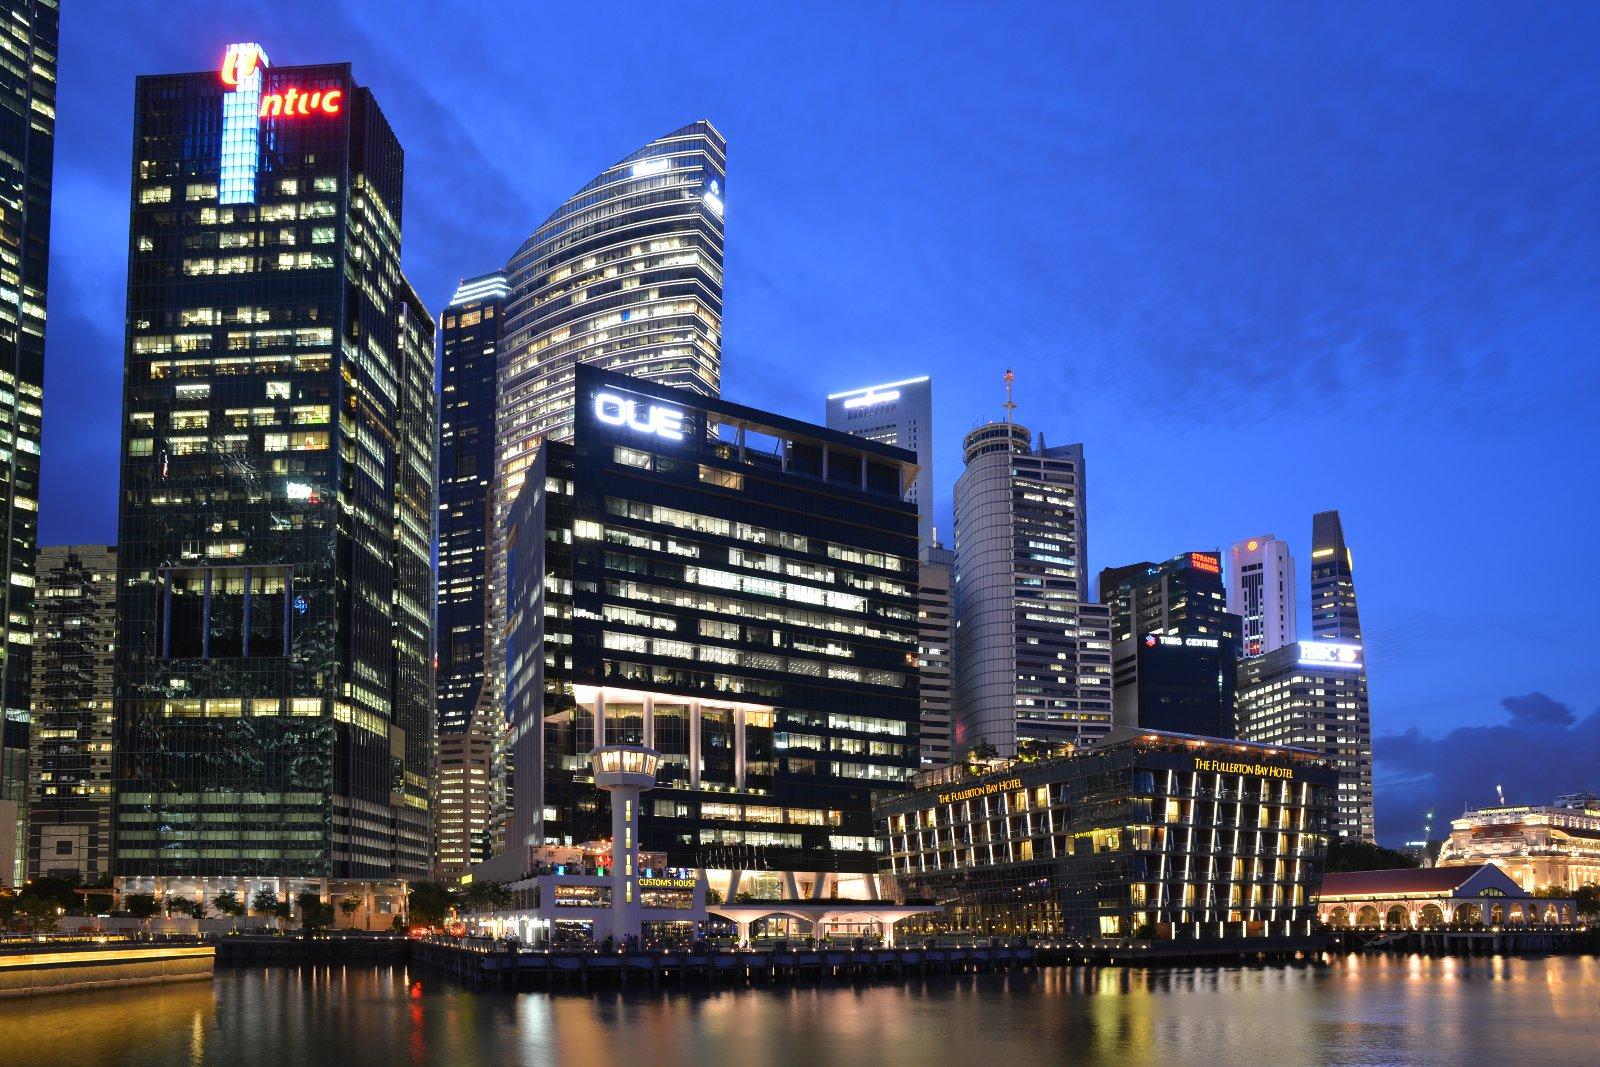 Singapore Restaurant One Star Michelin